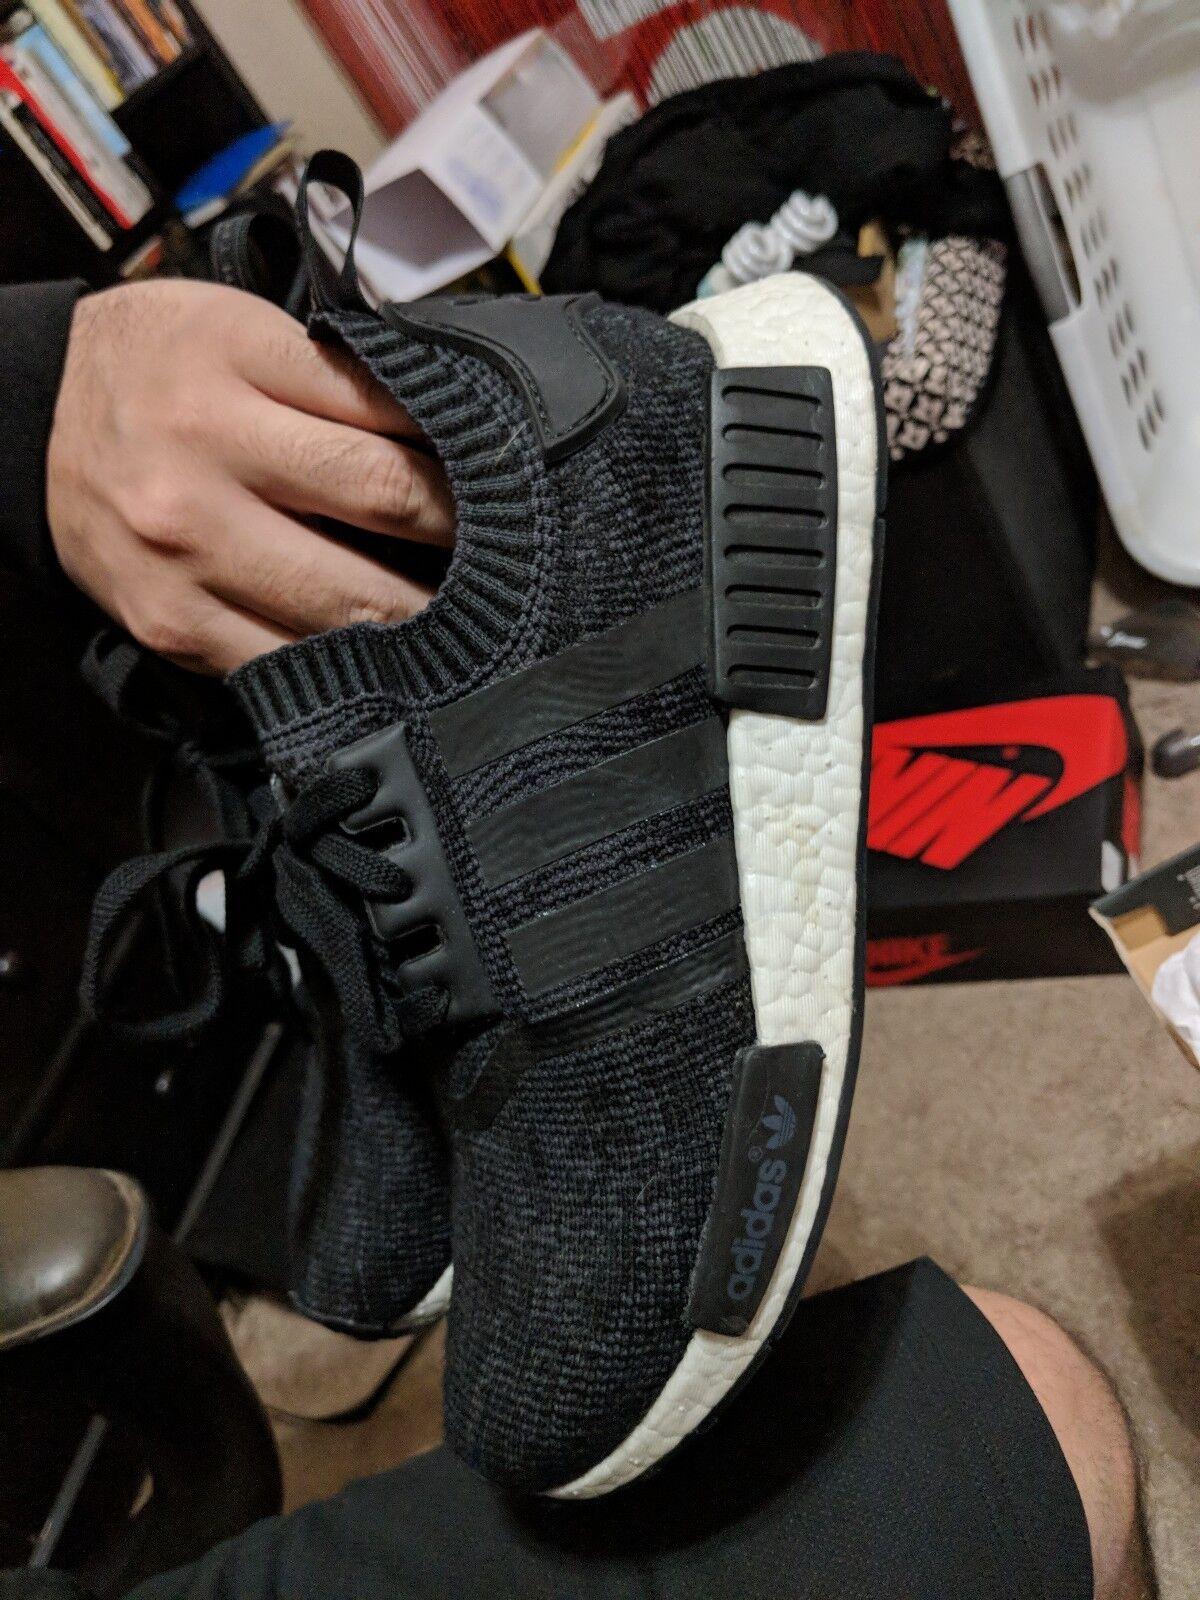 Adidas nmd r1 pk inverno lana dimensioni leggermente indossato indossato indossato 9 48f63a